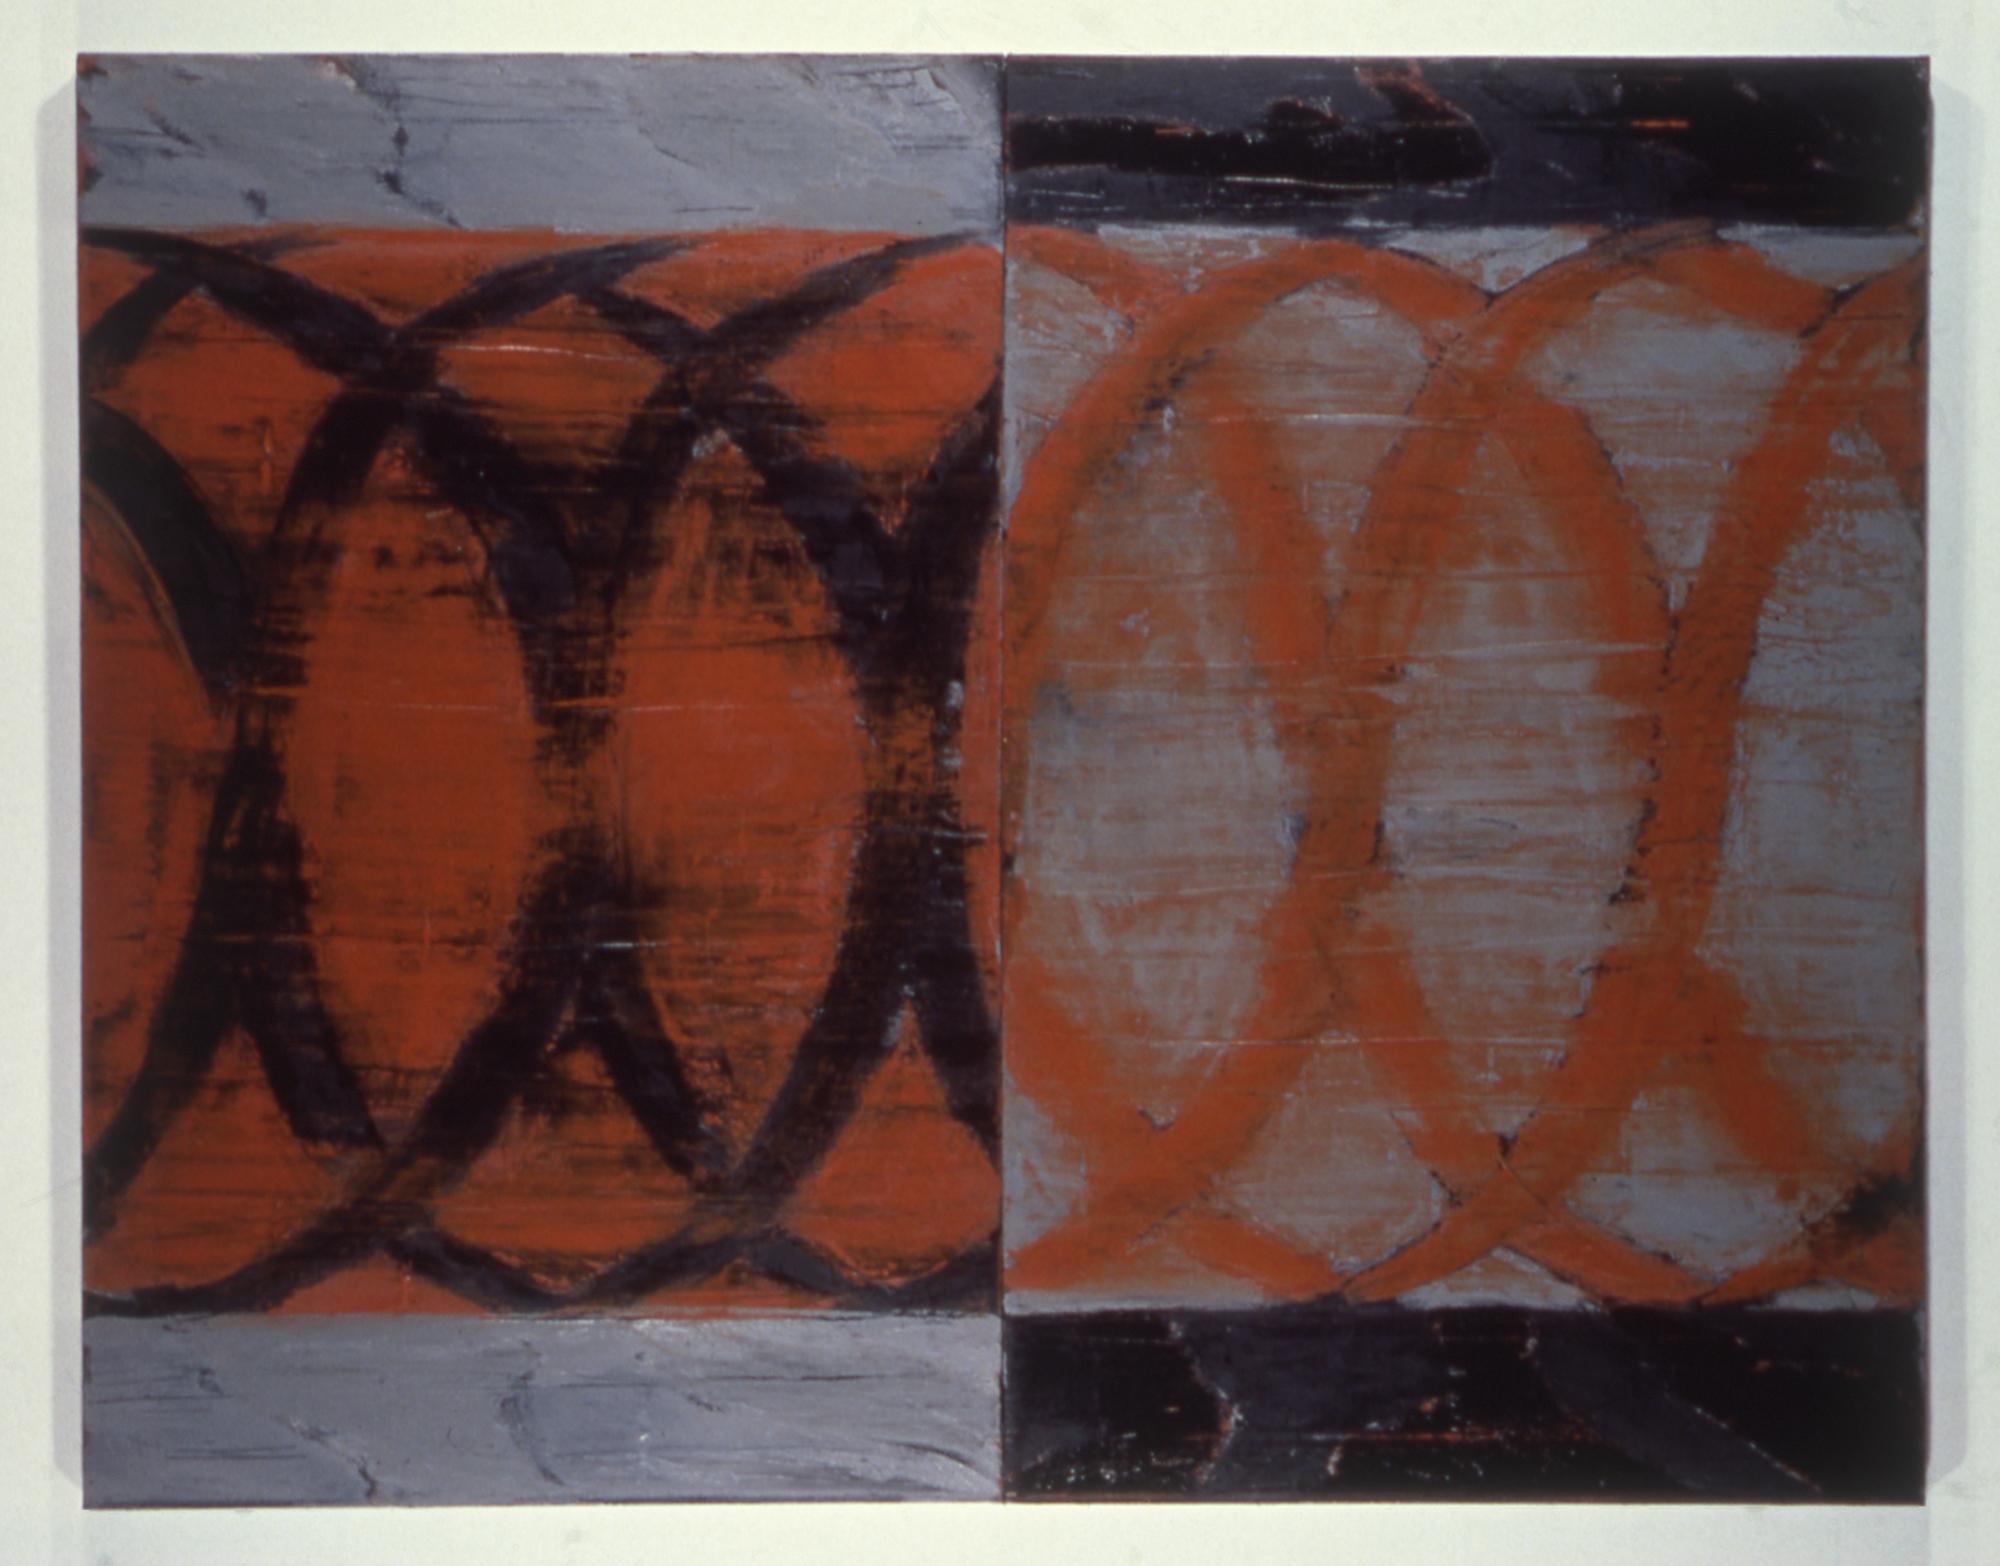 David Row - Double Helix